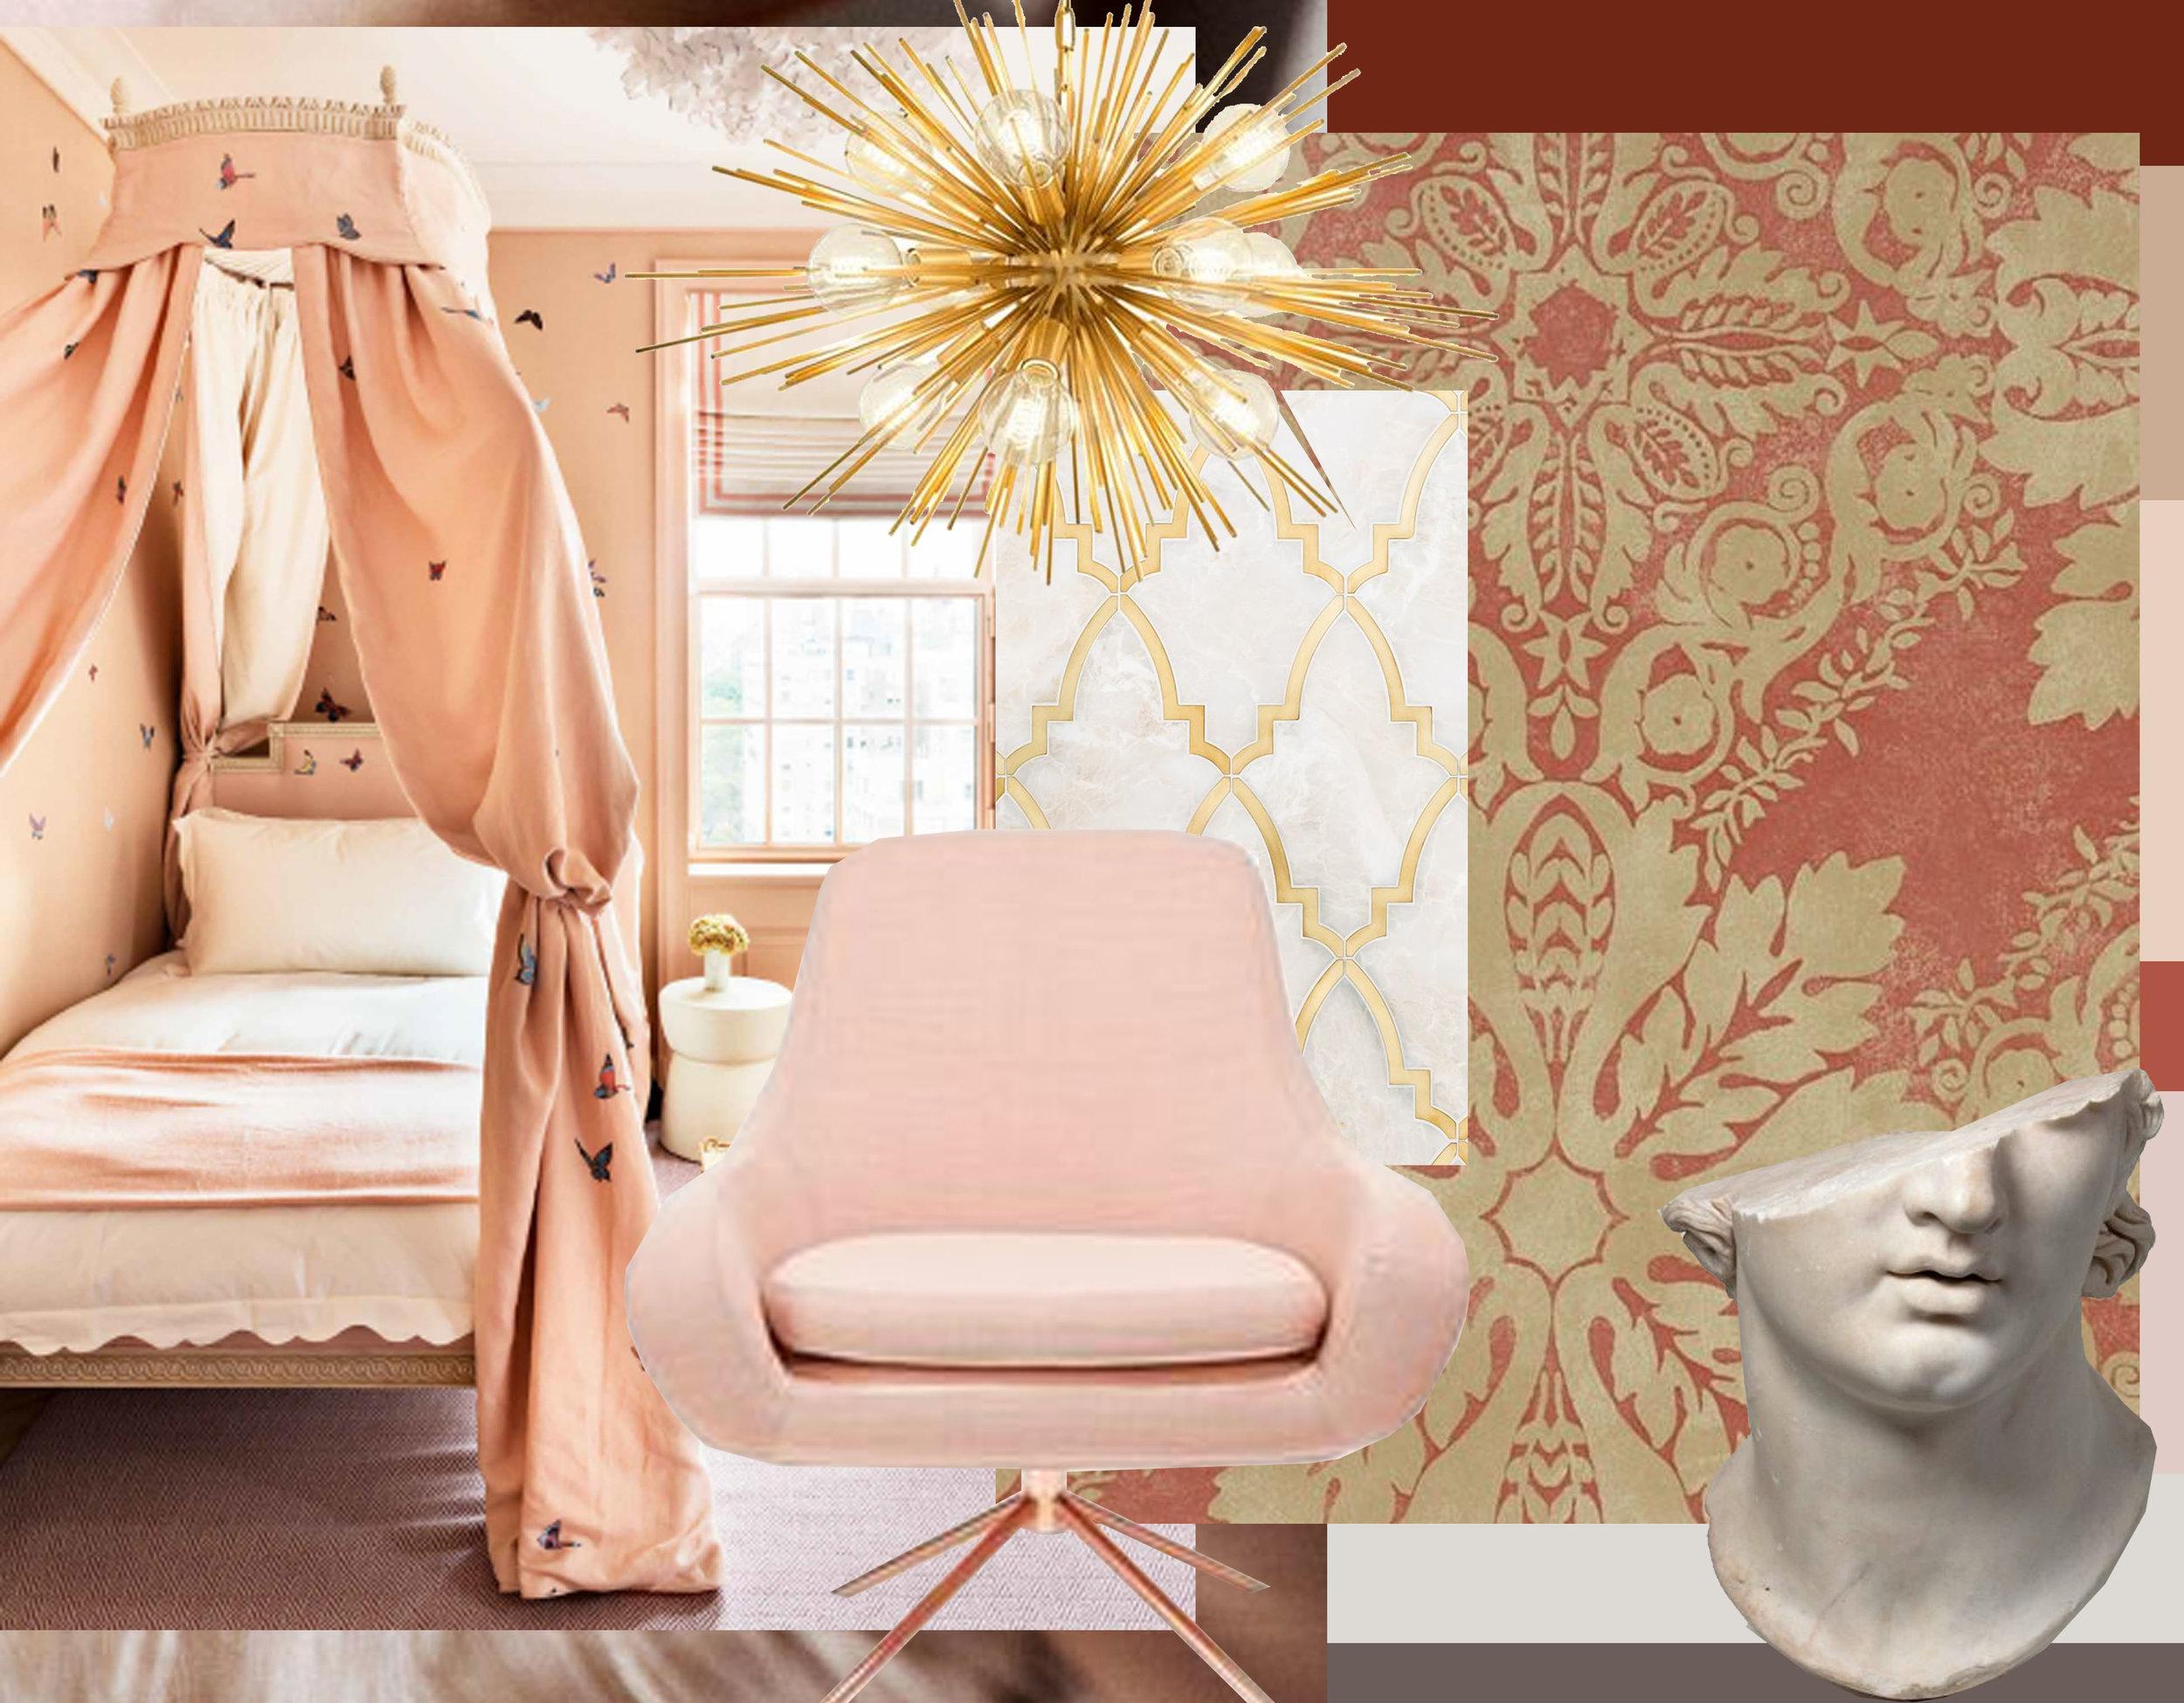 Image bedroom De Gournay via  Pictaram  - Boivin hanging lamp  Eichholtz  - Paris Grande marble mosaic  Mosaique Merchlar  - armchair - Medevi wallpaper  Zoffany  - statue via  Jaded Mandarin